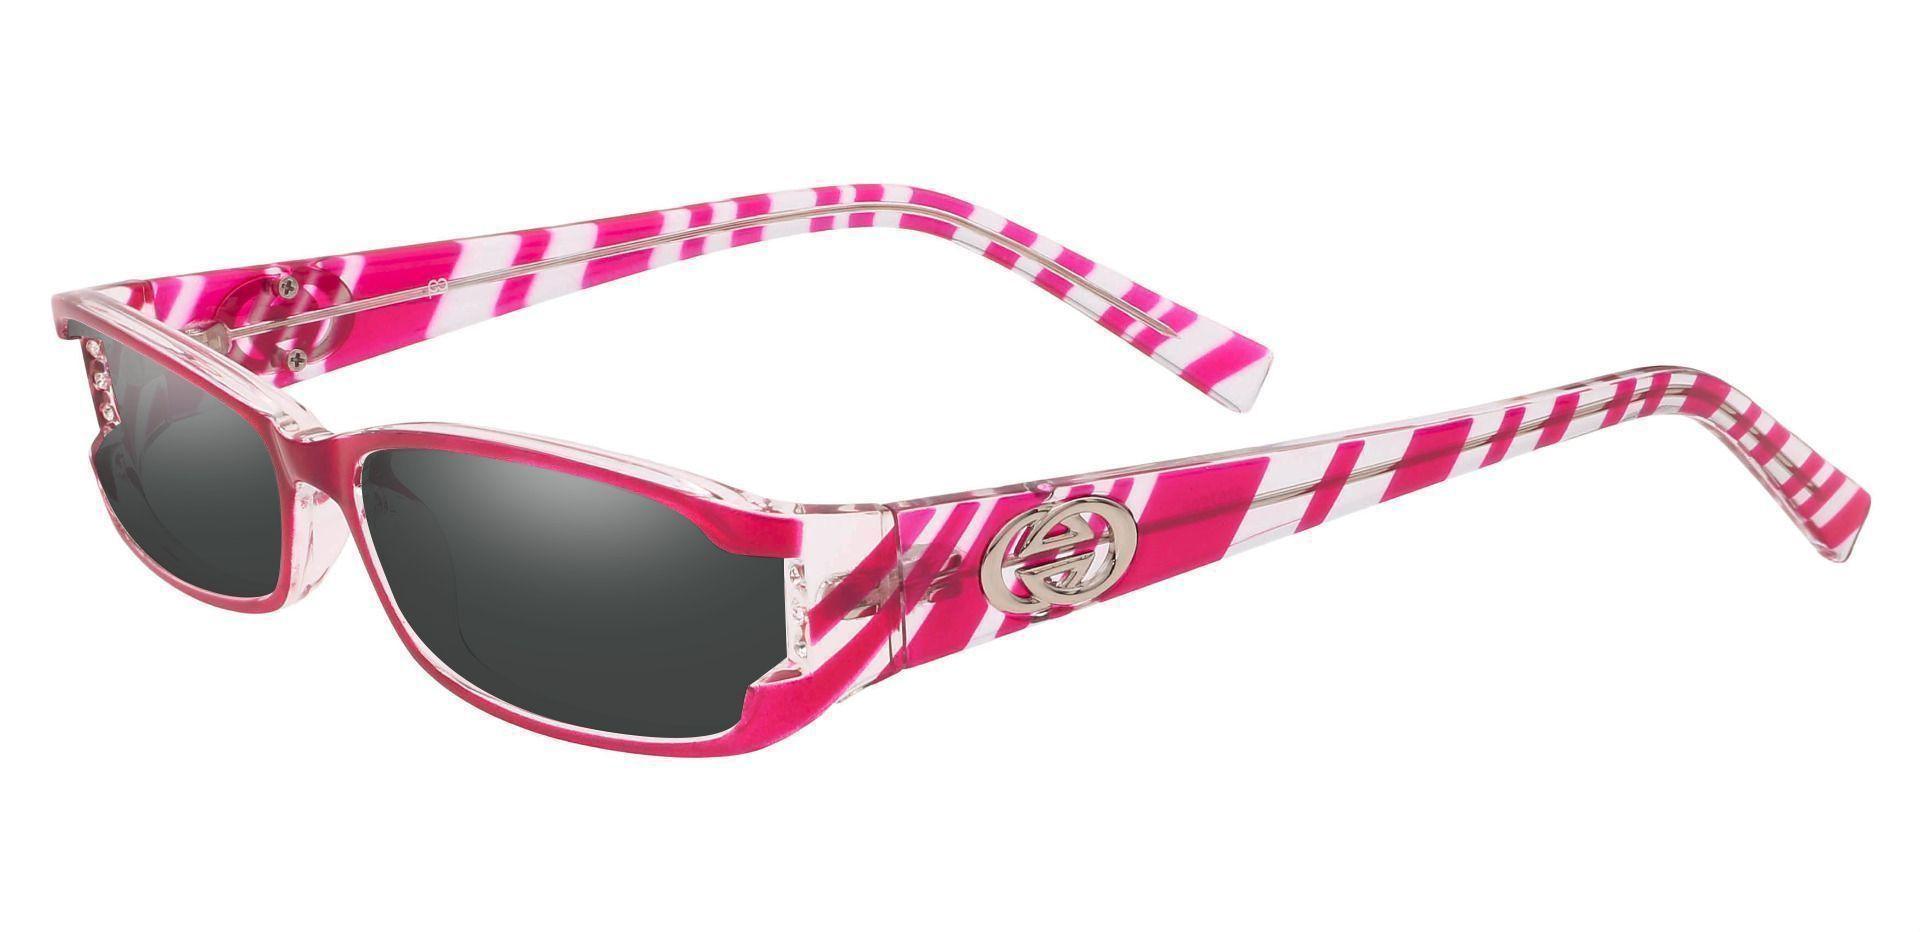 Kiki Rectangle Single Vision Sunglasses -  Pink Frame With Gray Lenses